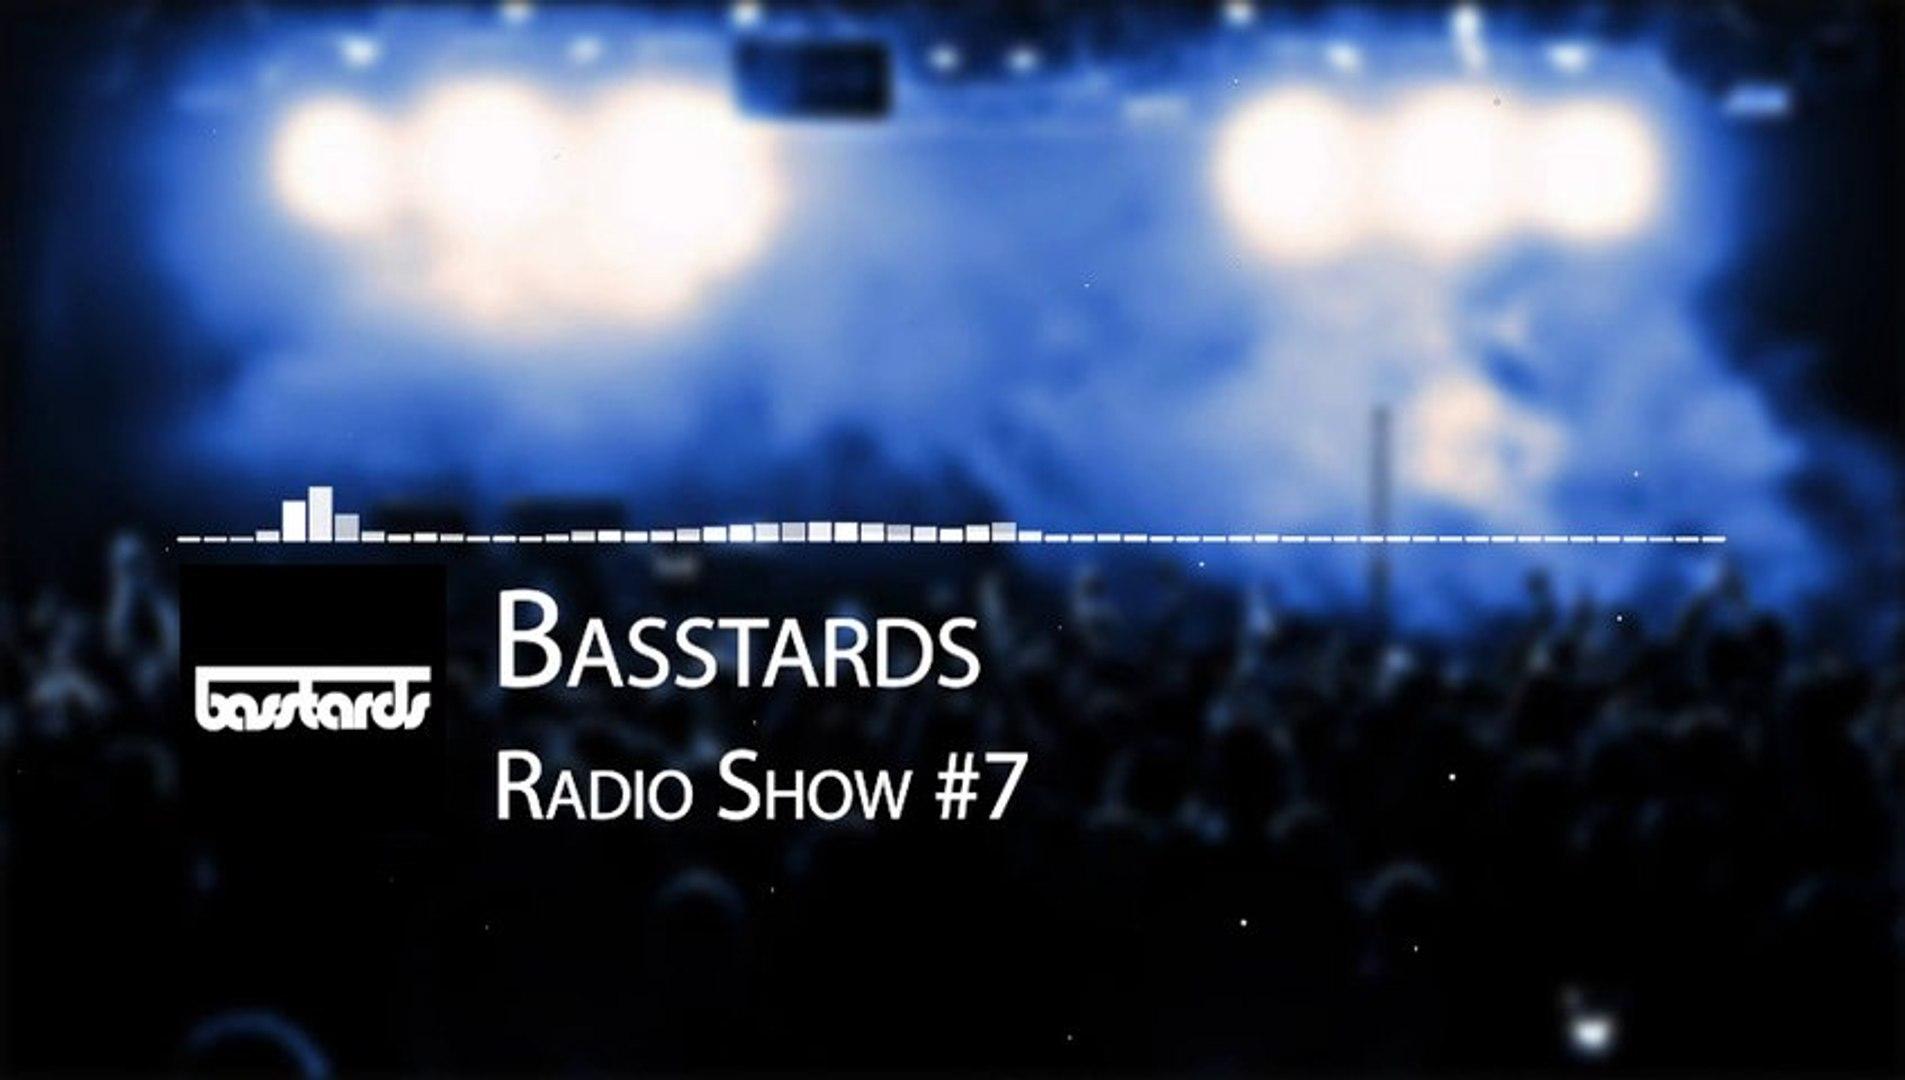 Basstards Radio Show #7